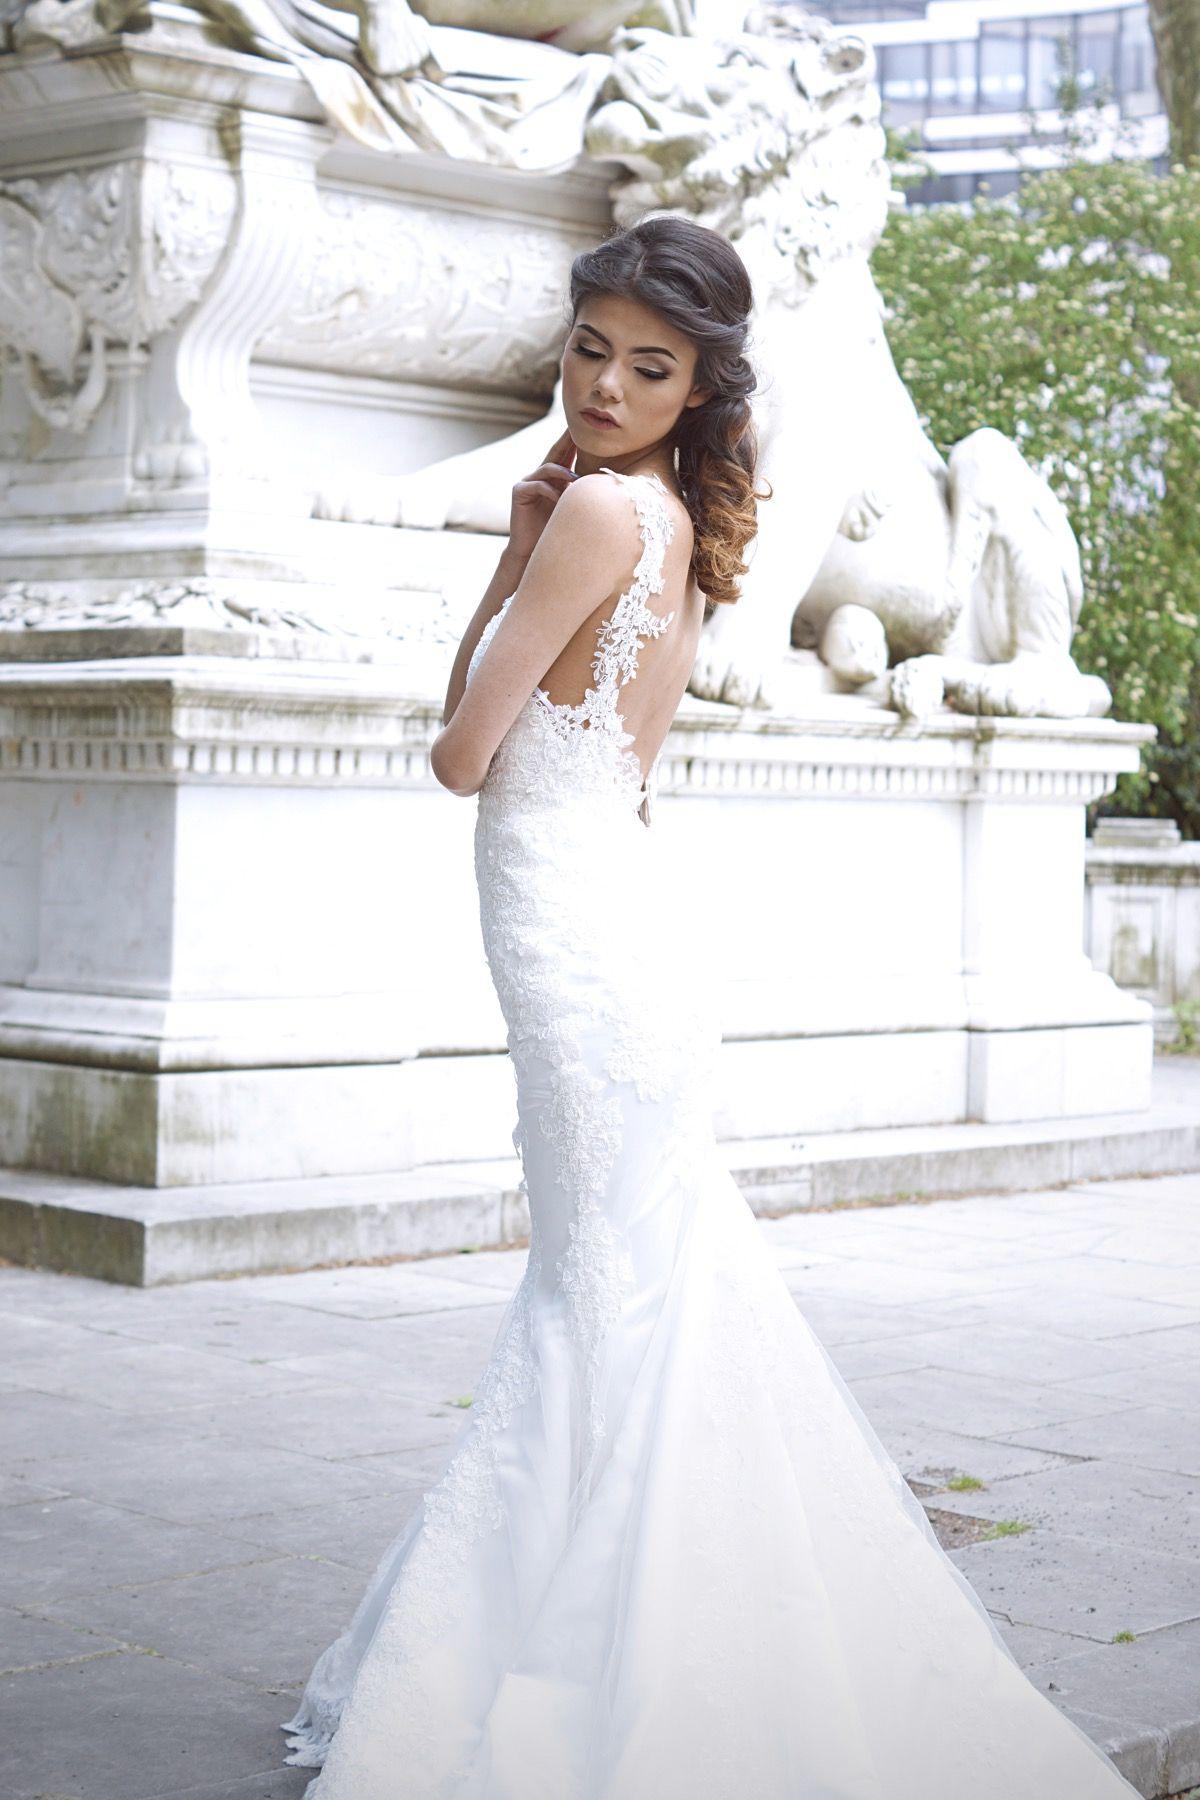 Brautkleid / Hochzeitskleid by EMANUEL HENDRIK - Düsseldorf, Germany ...